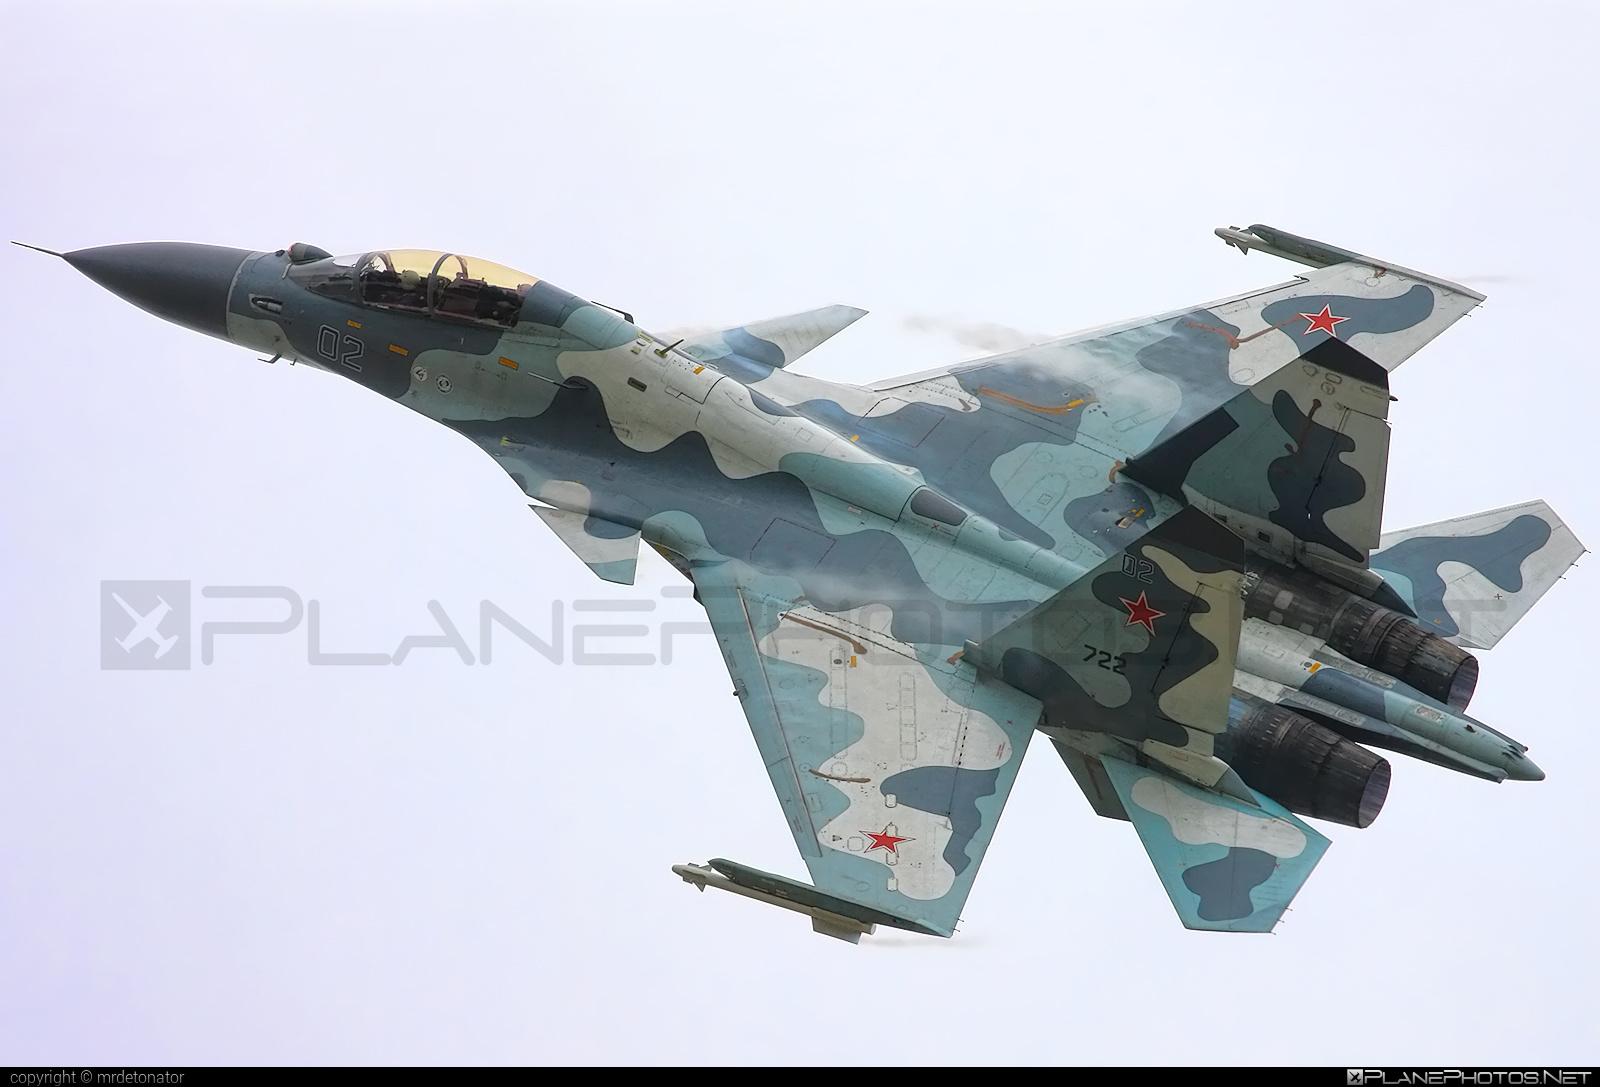 Sukhoi SU-30MK - 02 operated by Sukhoi Design Bureau #maks2009 #su30 #su30mk #sukhoi #sukhoi30 #sukhoisu30mk